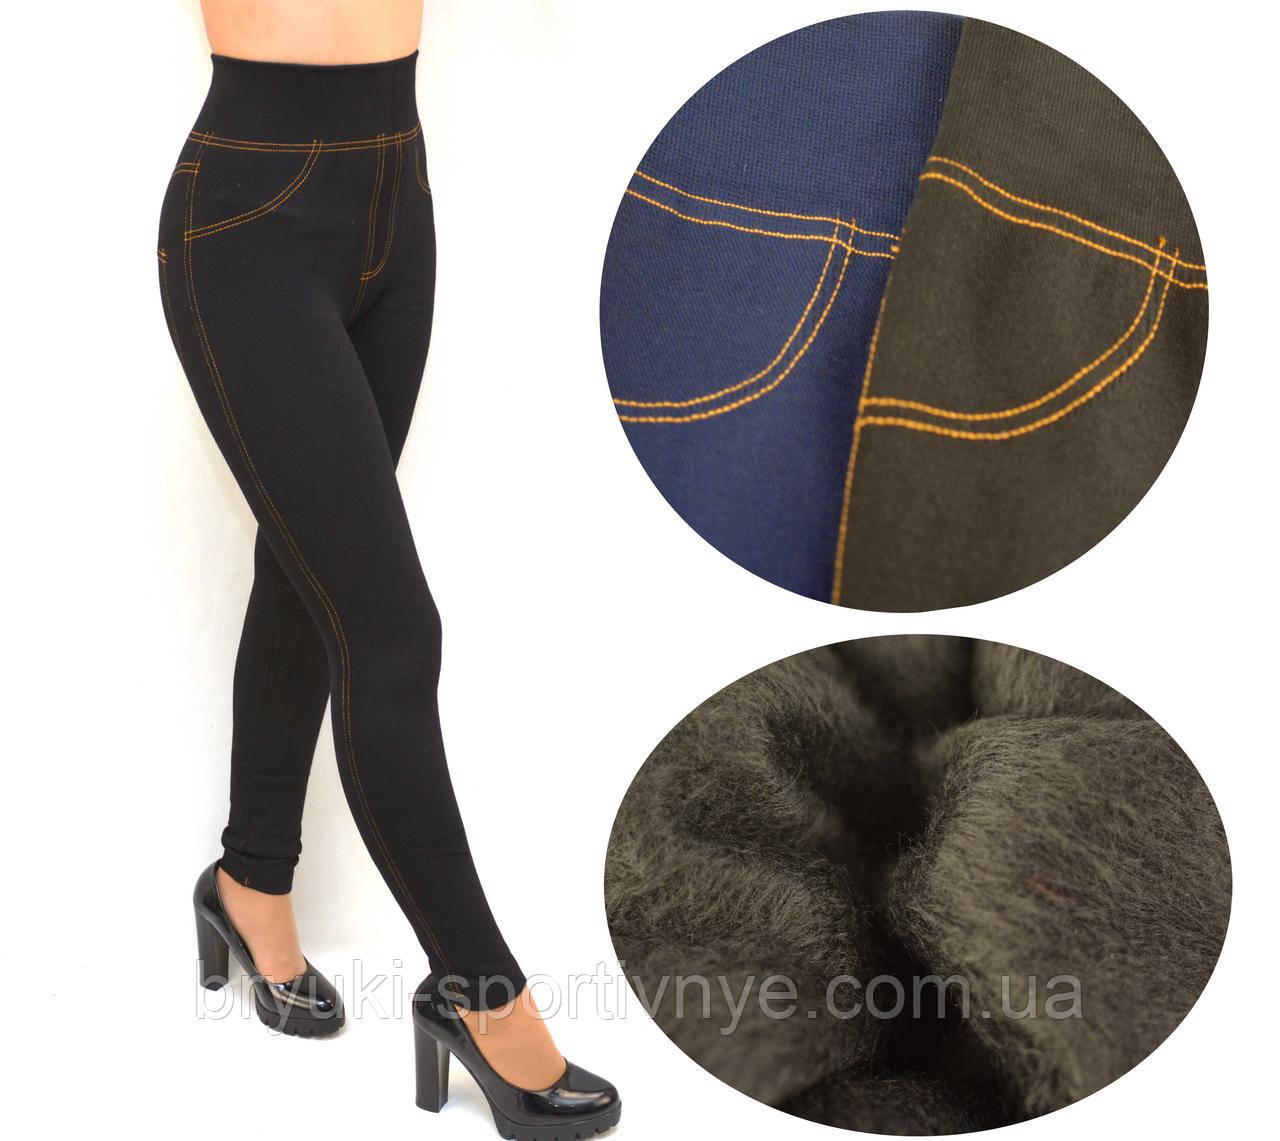 Лосины на меху под джинс